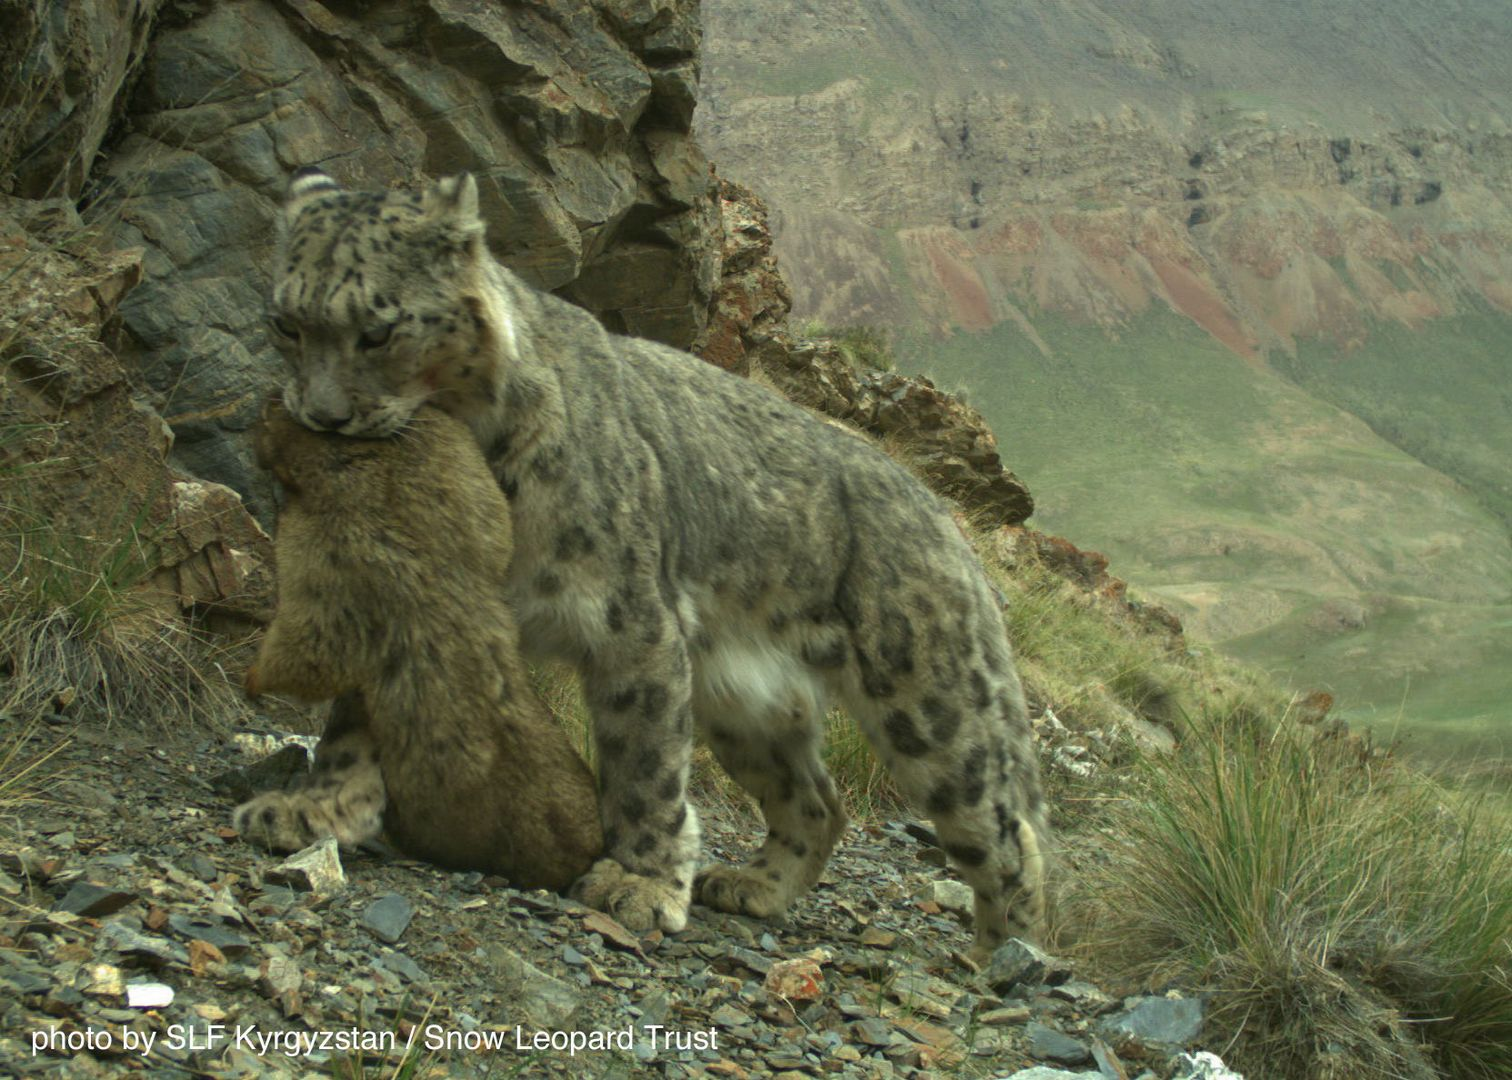 Kyrgyzstan-cat-web-2015-5